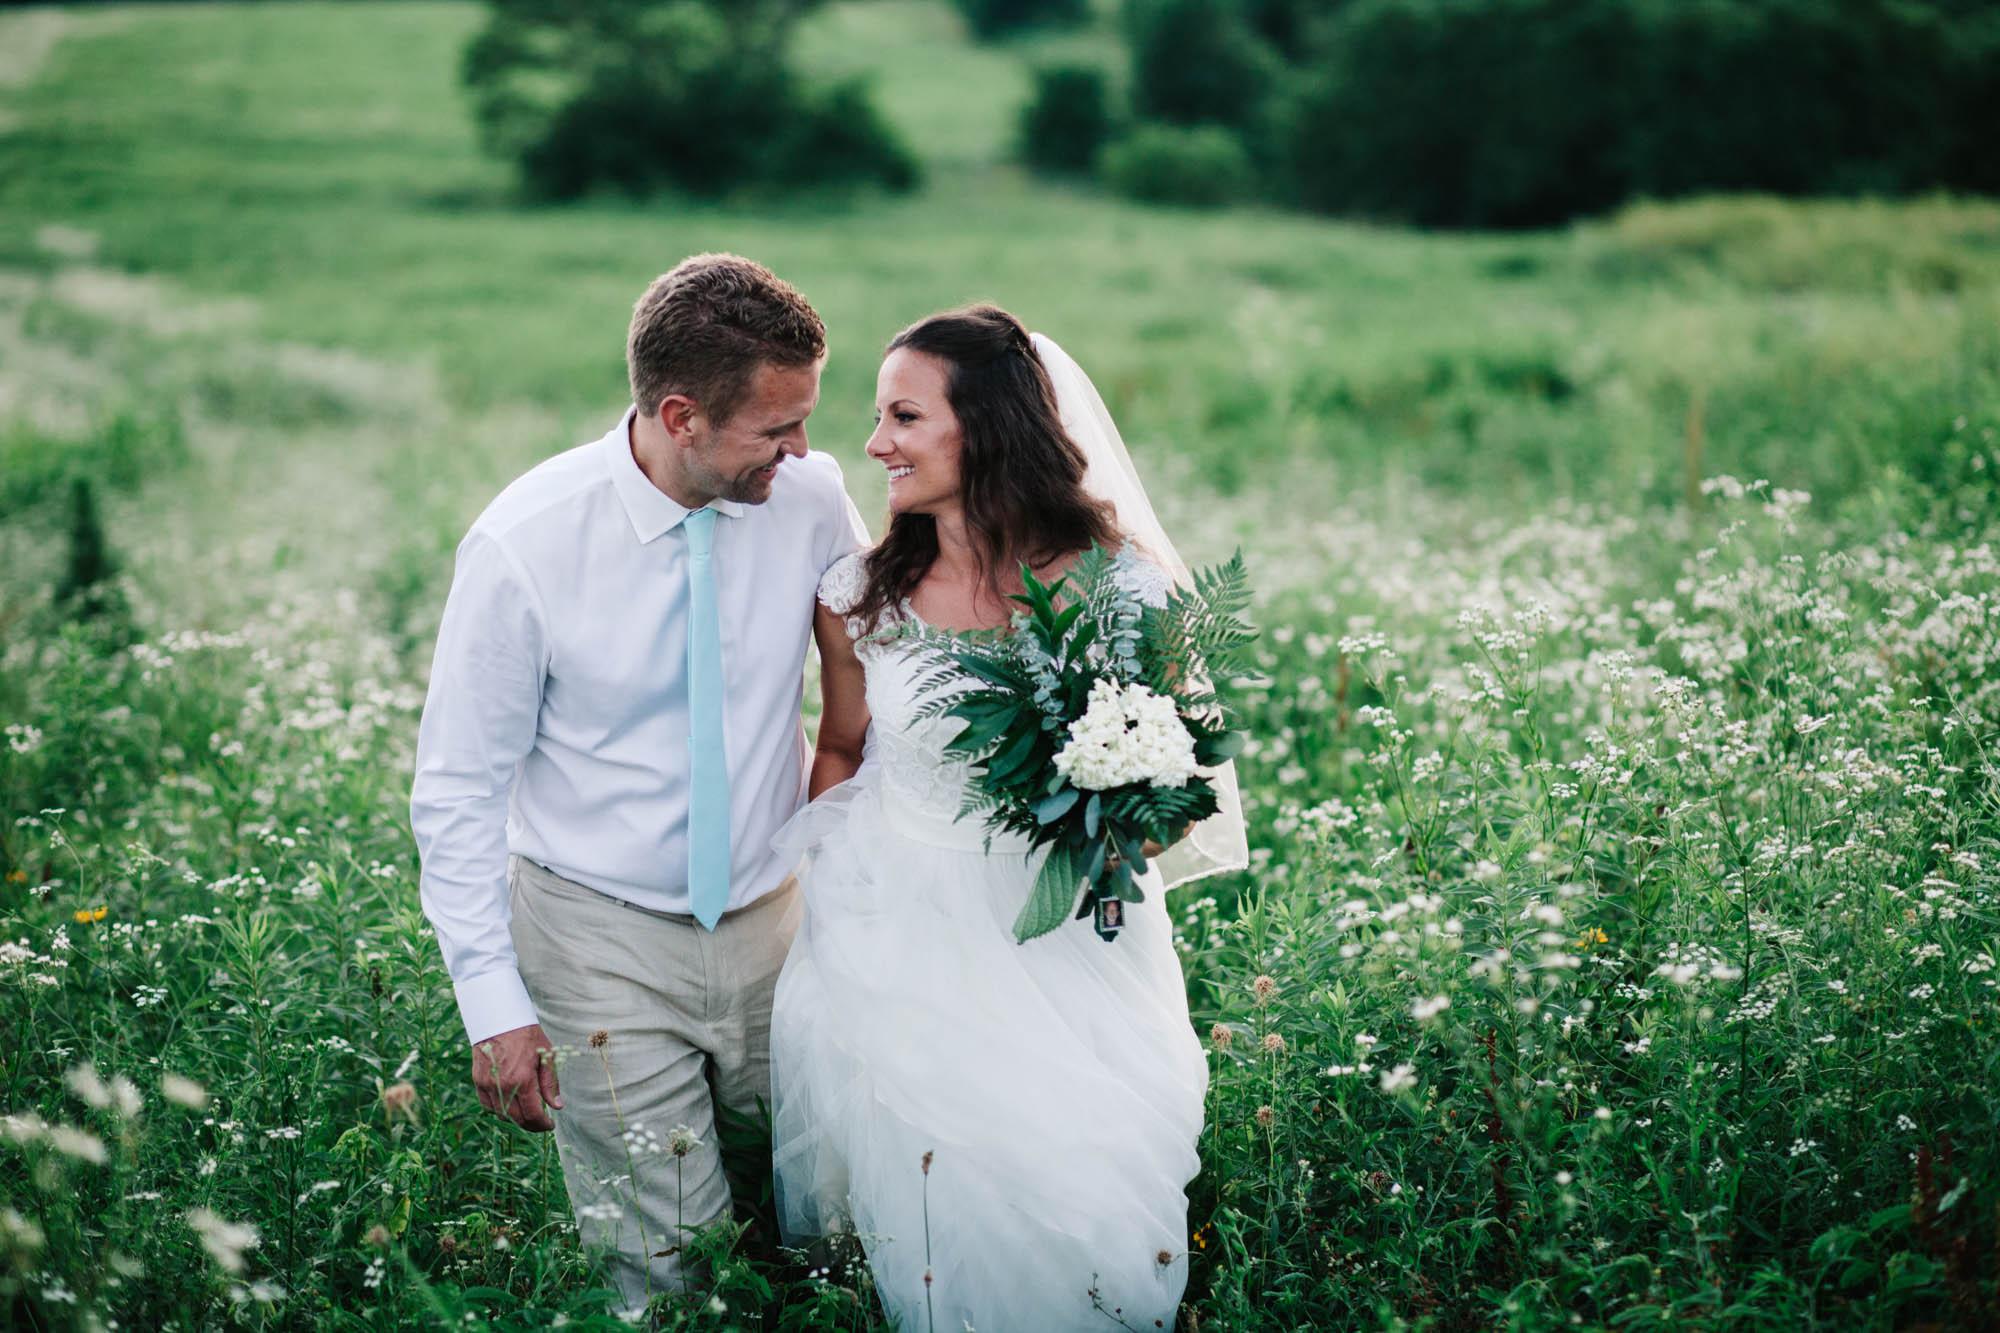 shakervillagewedding-18.jpg